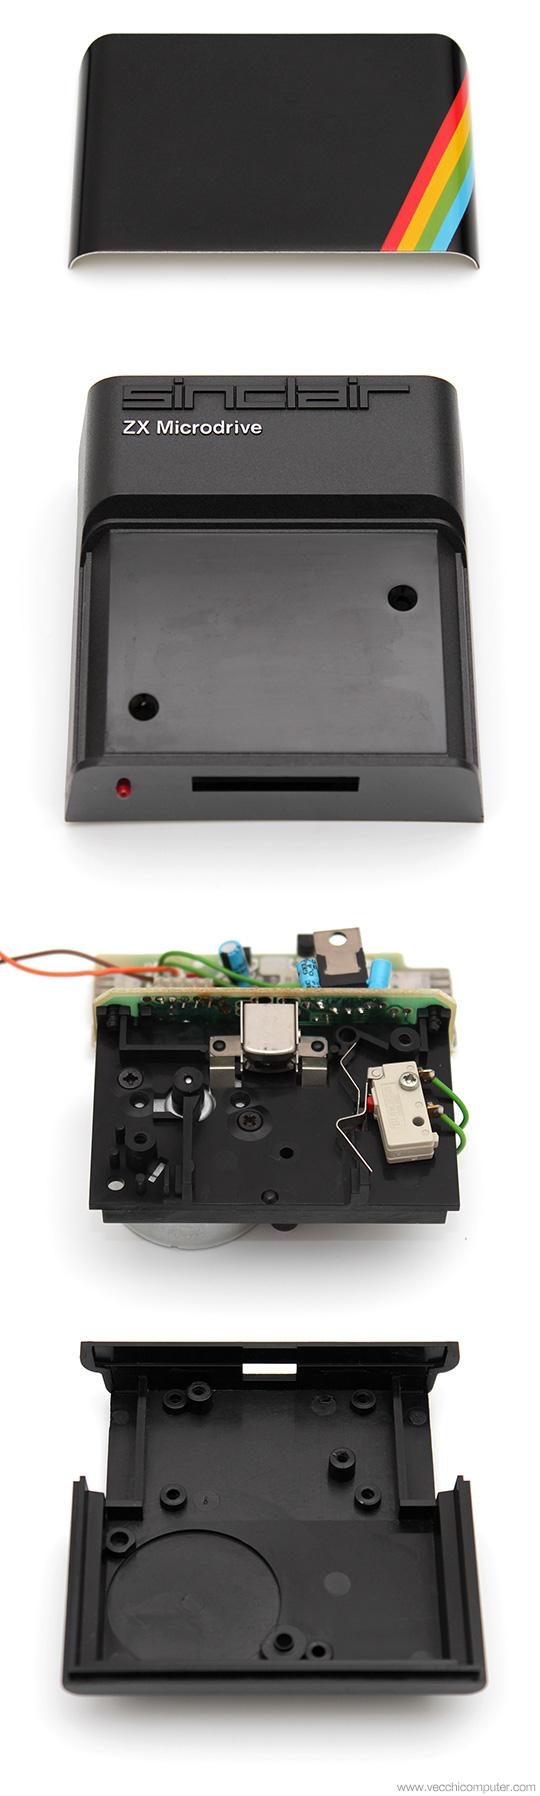 Sinclair ZX Microdrive - Esploso